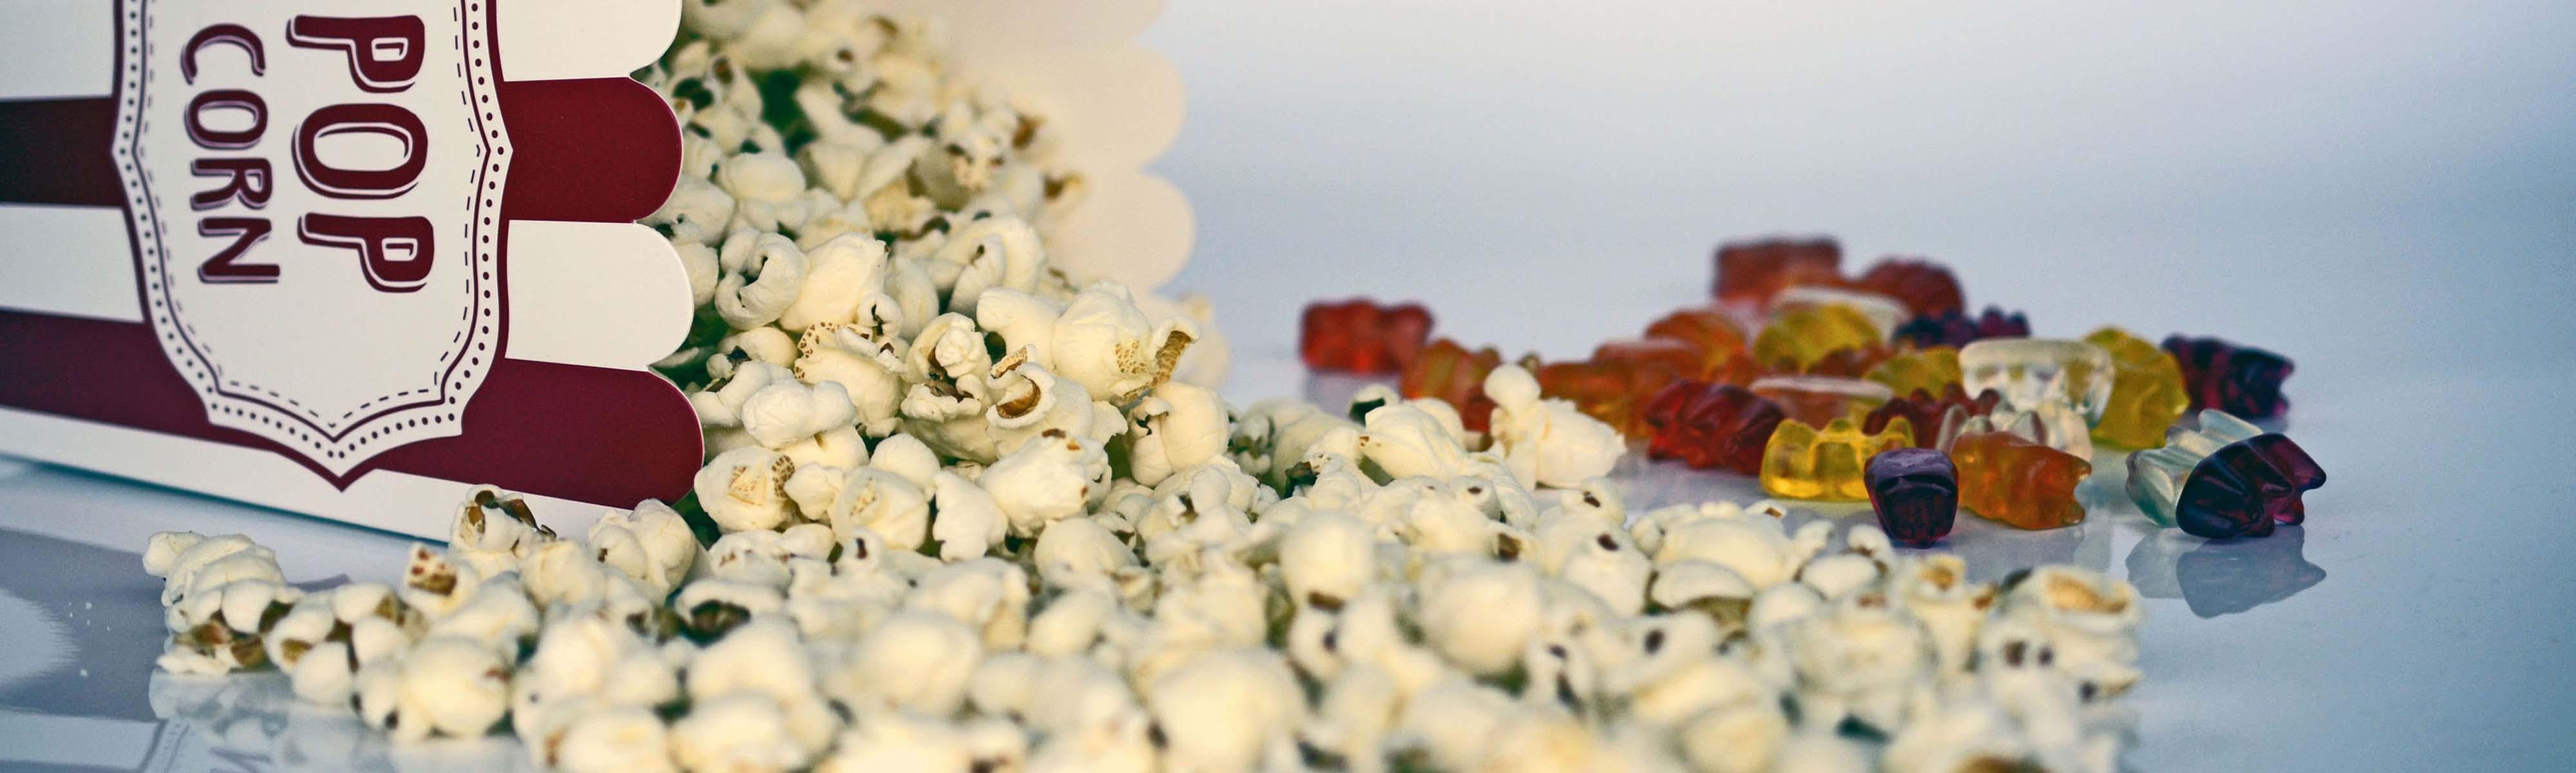 Kino Kinoerlebnis Popkorn Werbung Kinwerbung